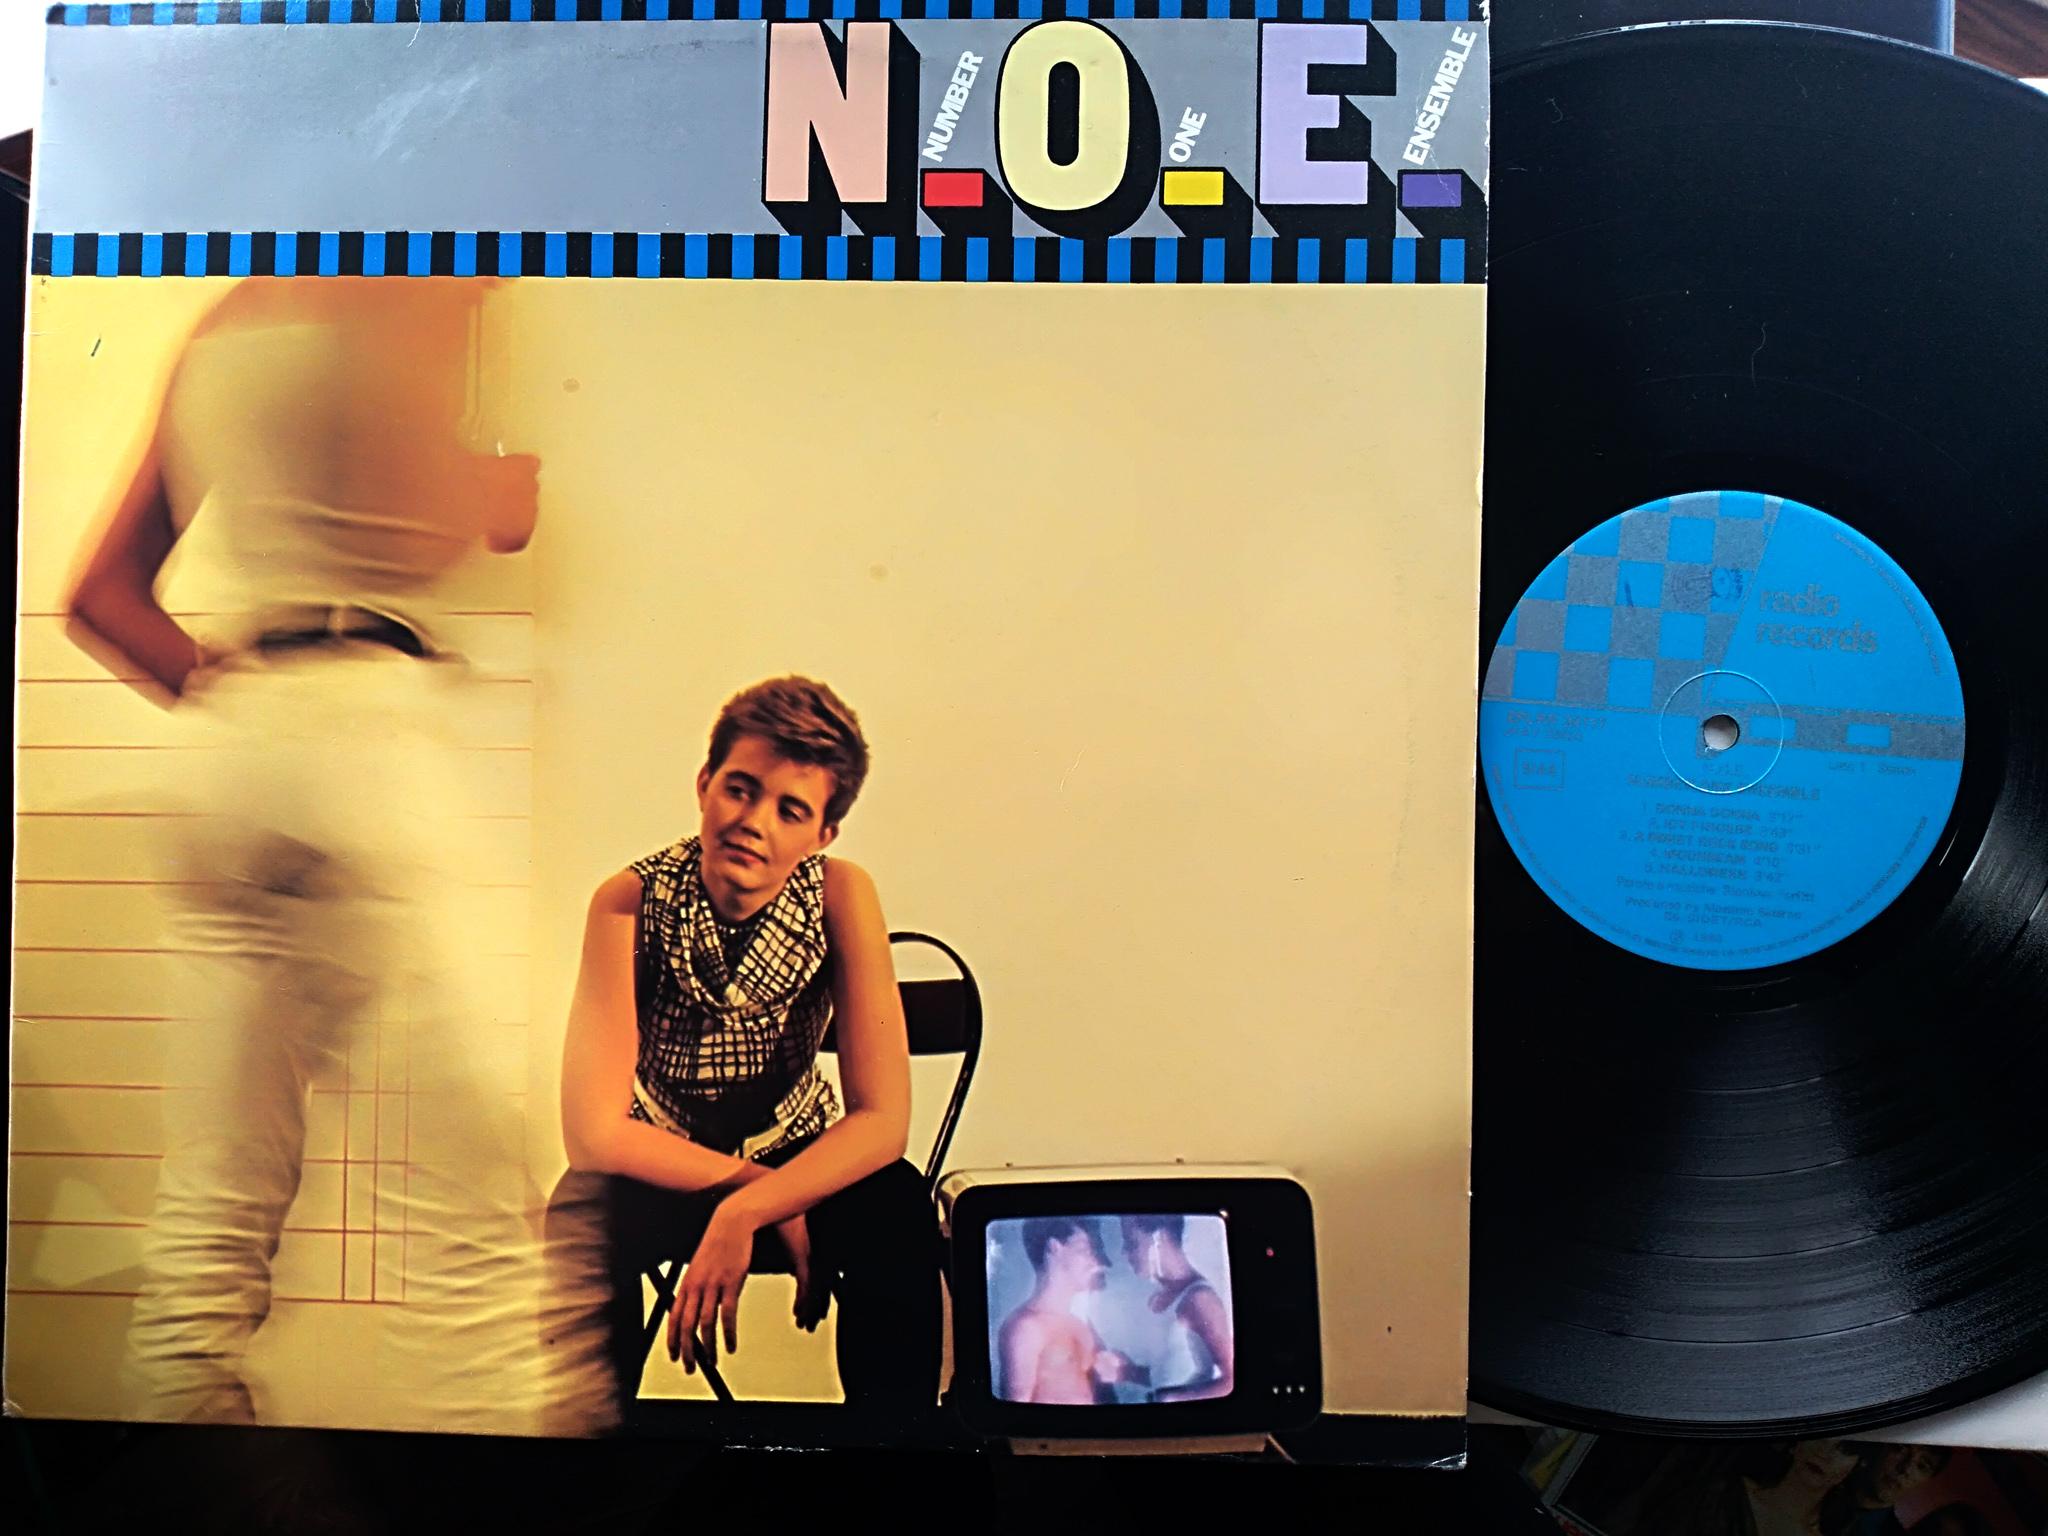 N.O.E. - Number One Ensemble